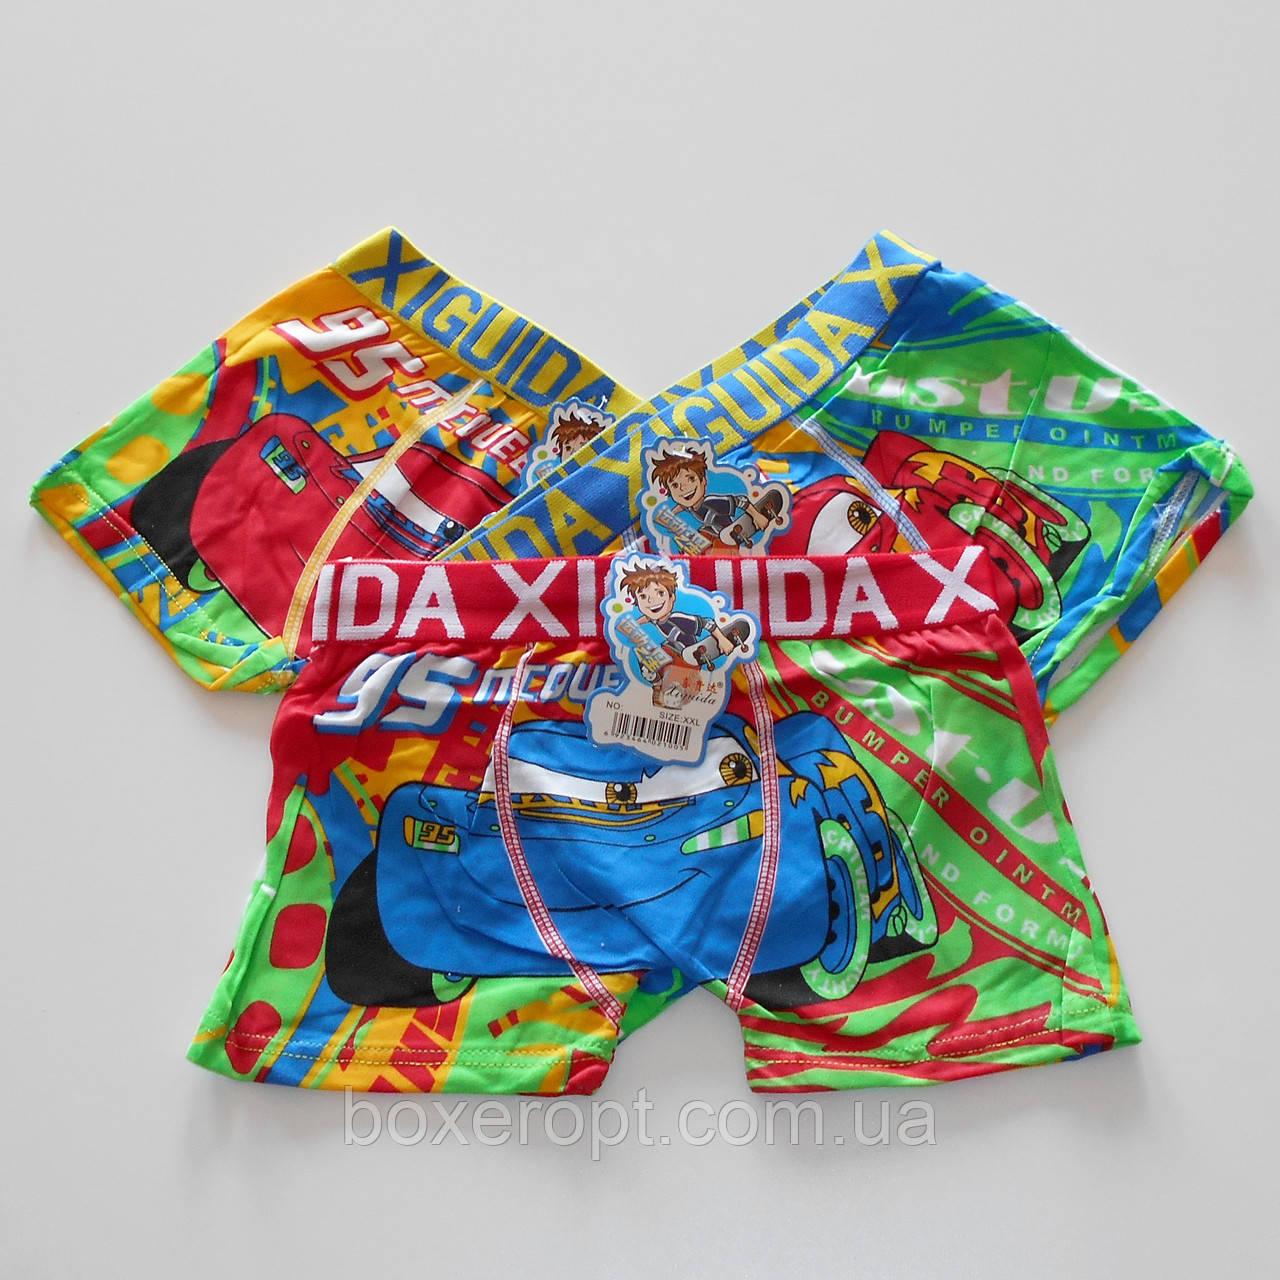 Детские трусы Xiguida - 15.00 грн./шт. NO:McQueen